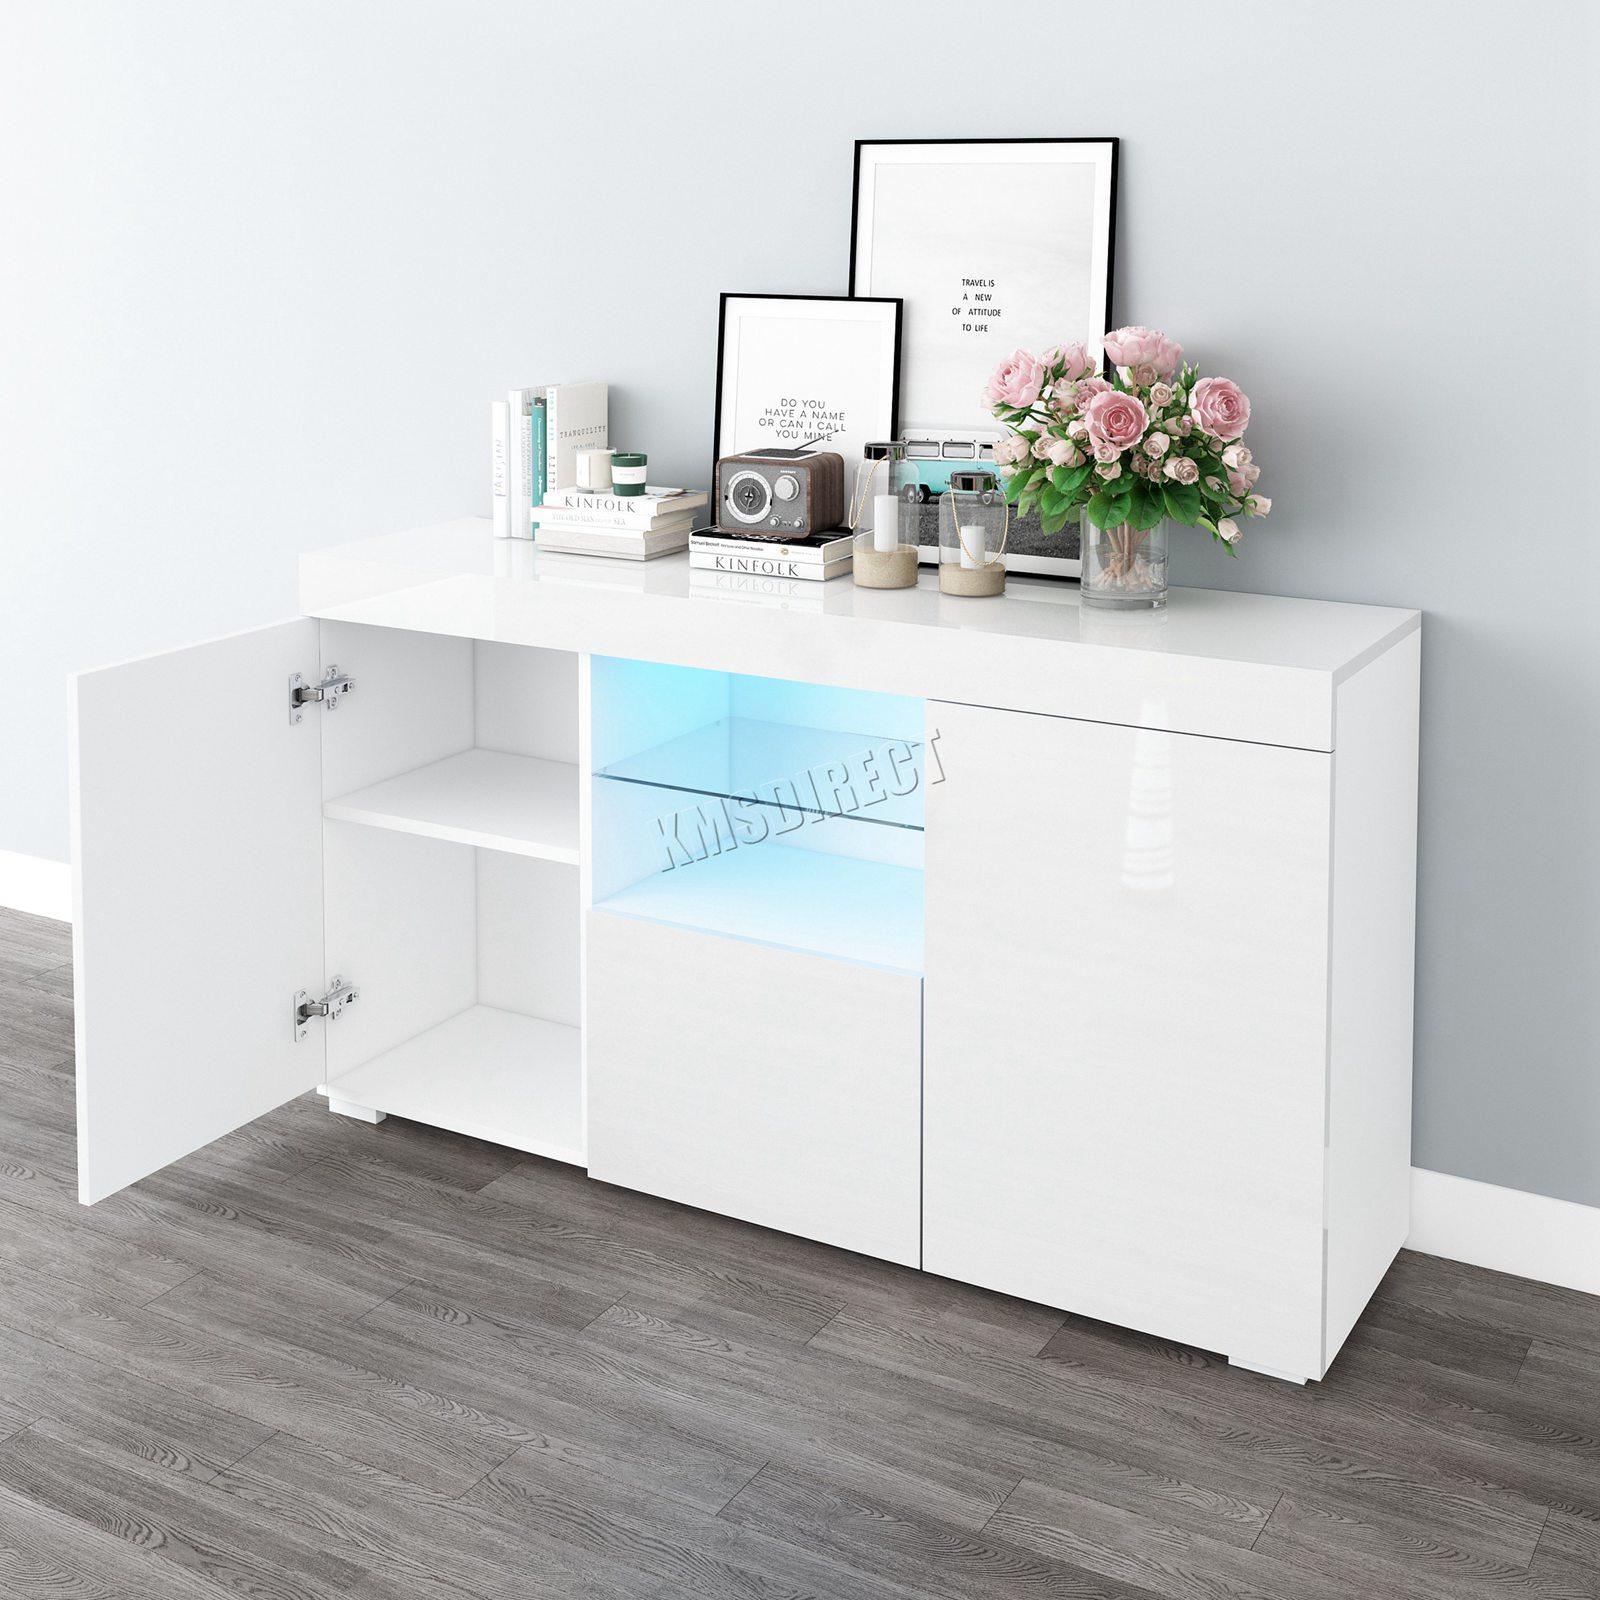 WestWood-PB-High-Gloss-Cabinet-LED-Bookshelf-Sideboard-Cupboard-Home-Unit-PHC03 thumbnail 27